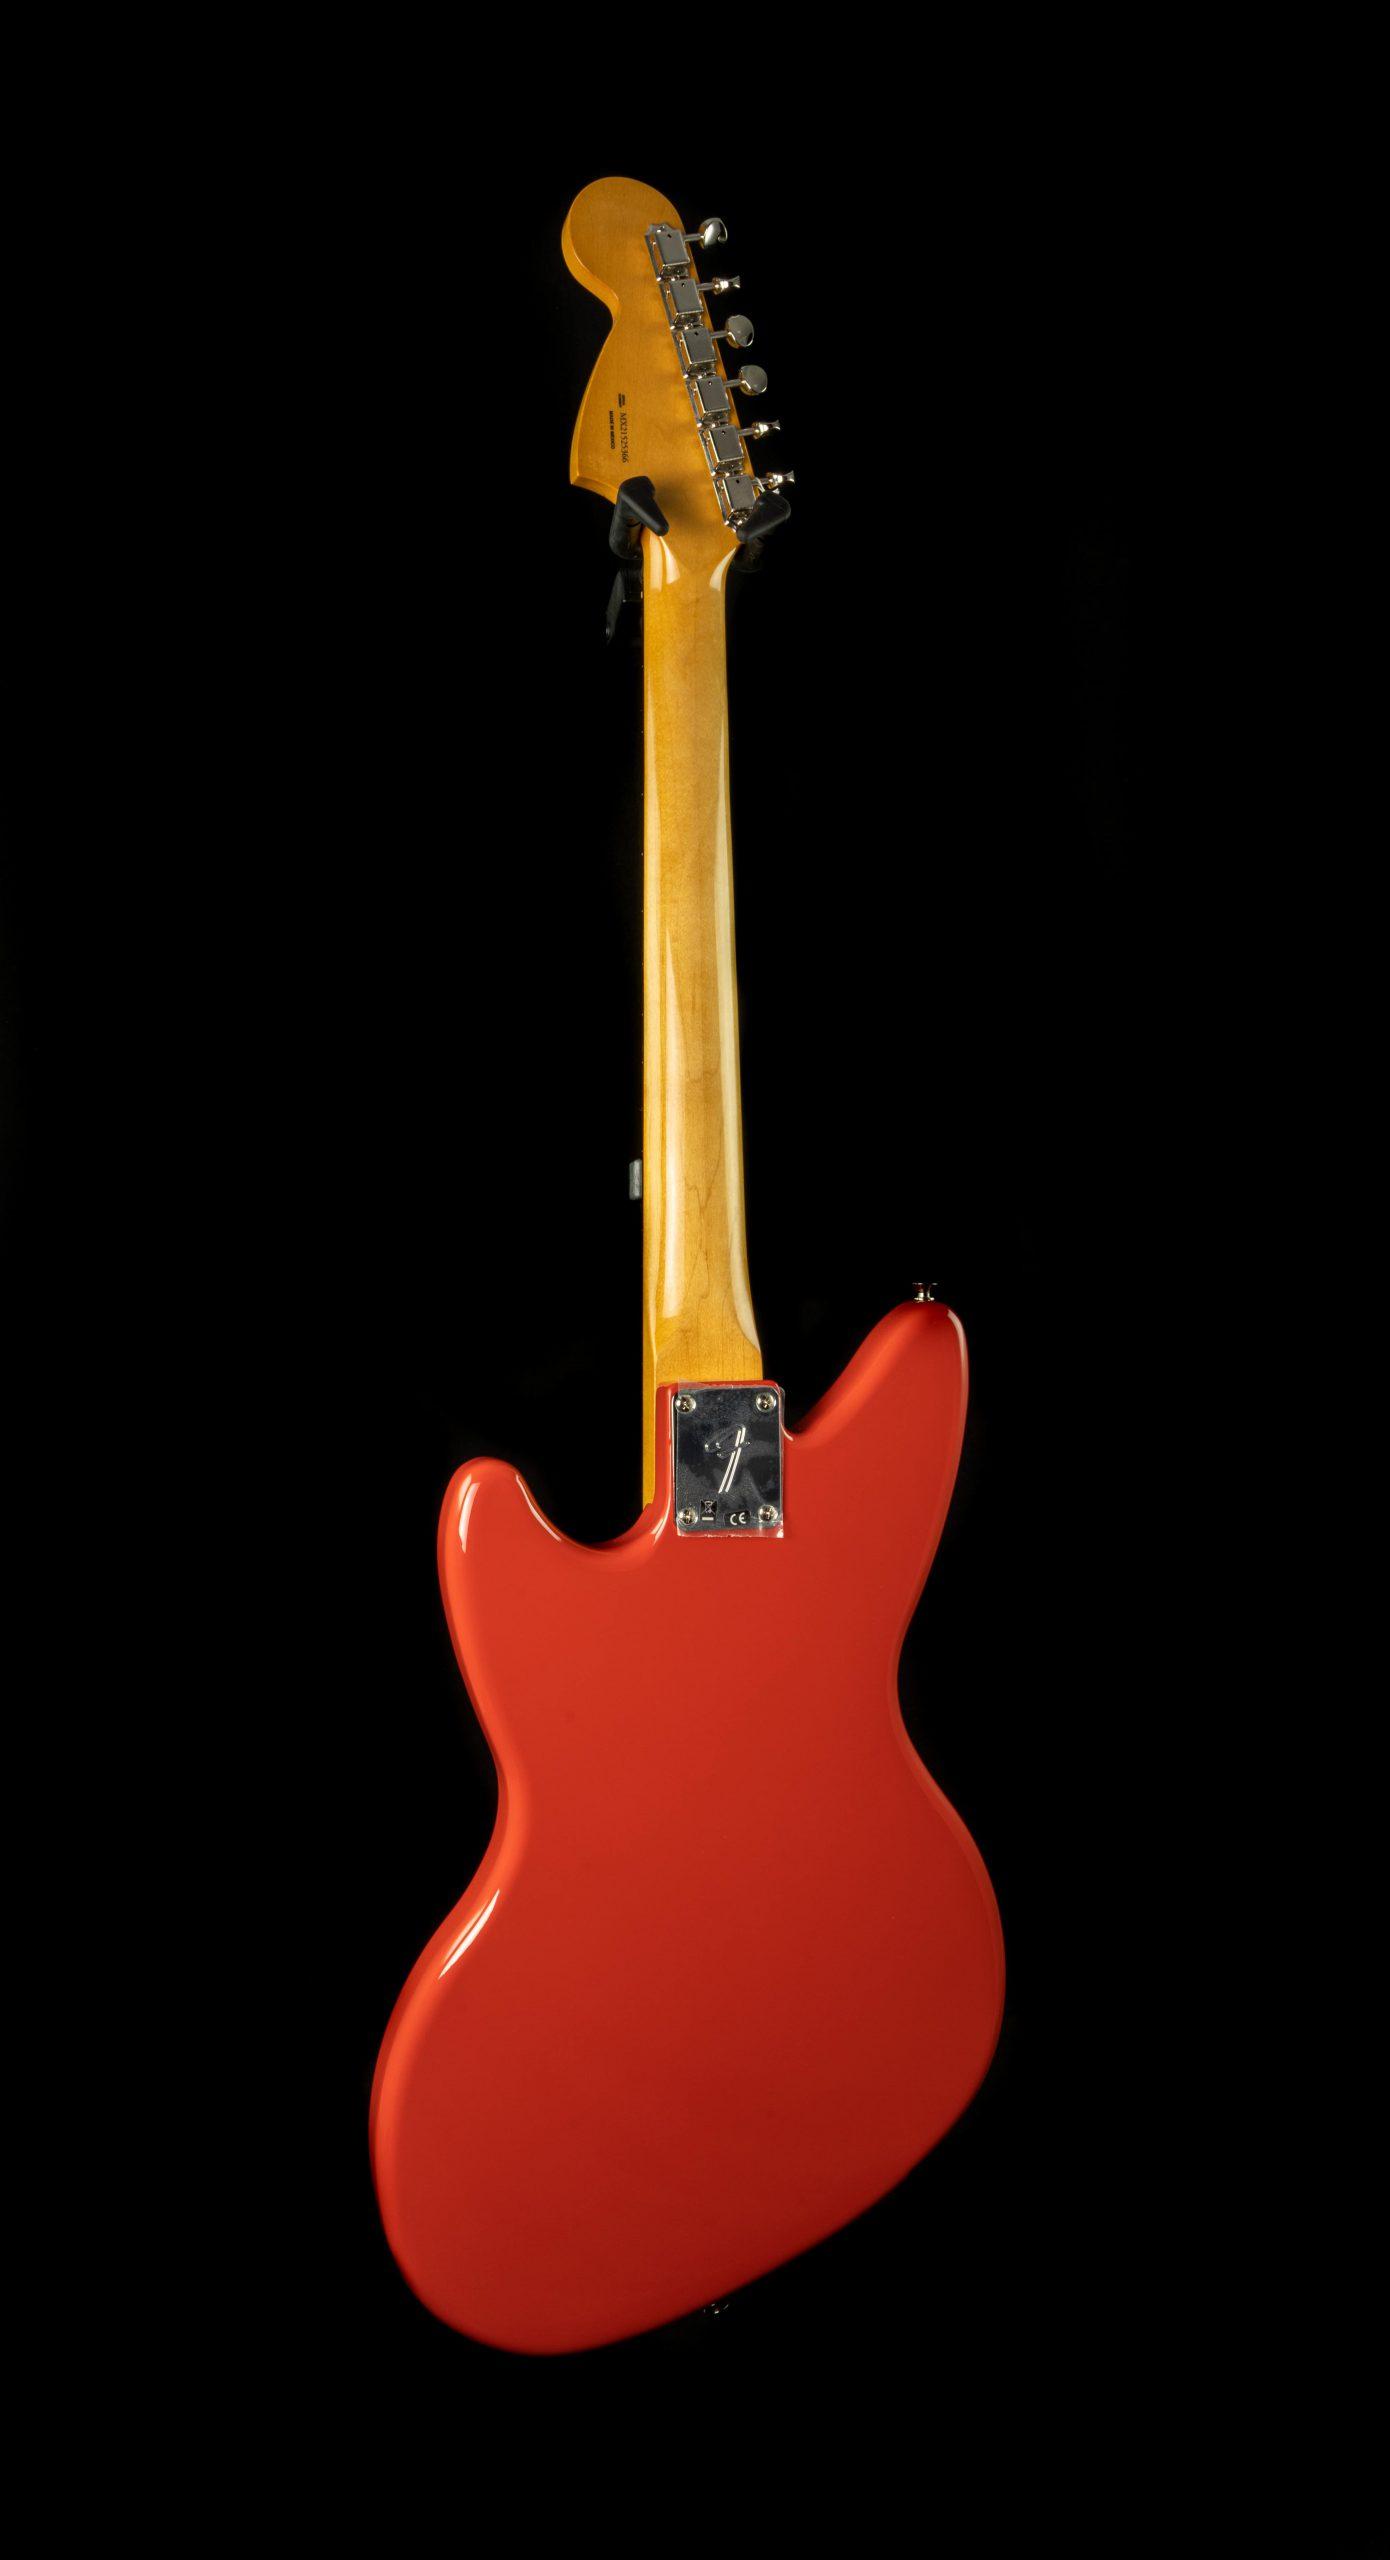 Fender Kurt Cobain Jag-Stang in Fiesta Red